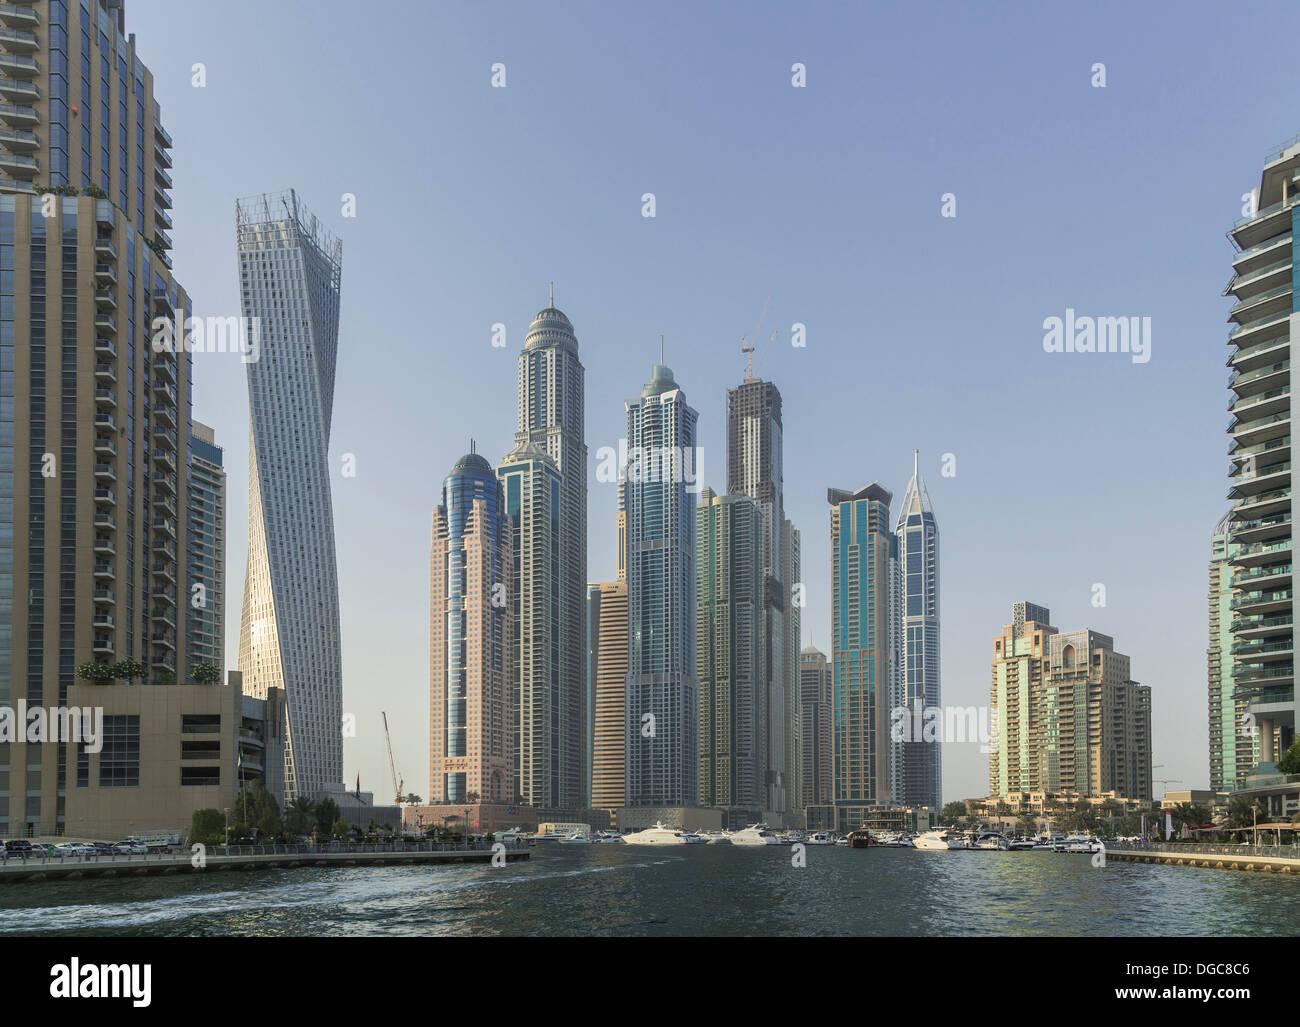 Rascacielos de Dubai Marina, Dubai, Emiratos Árabes Unidos. Imagen De Stock